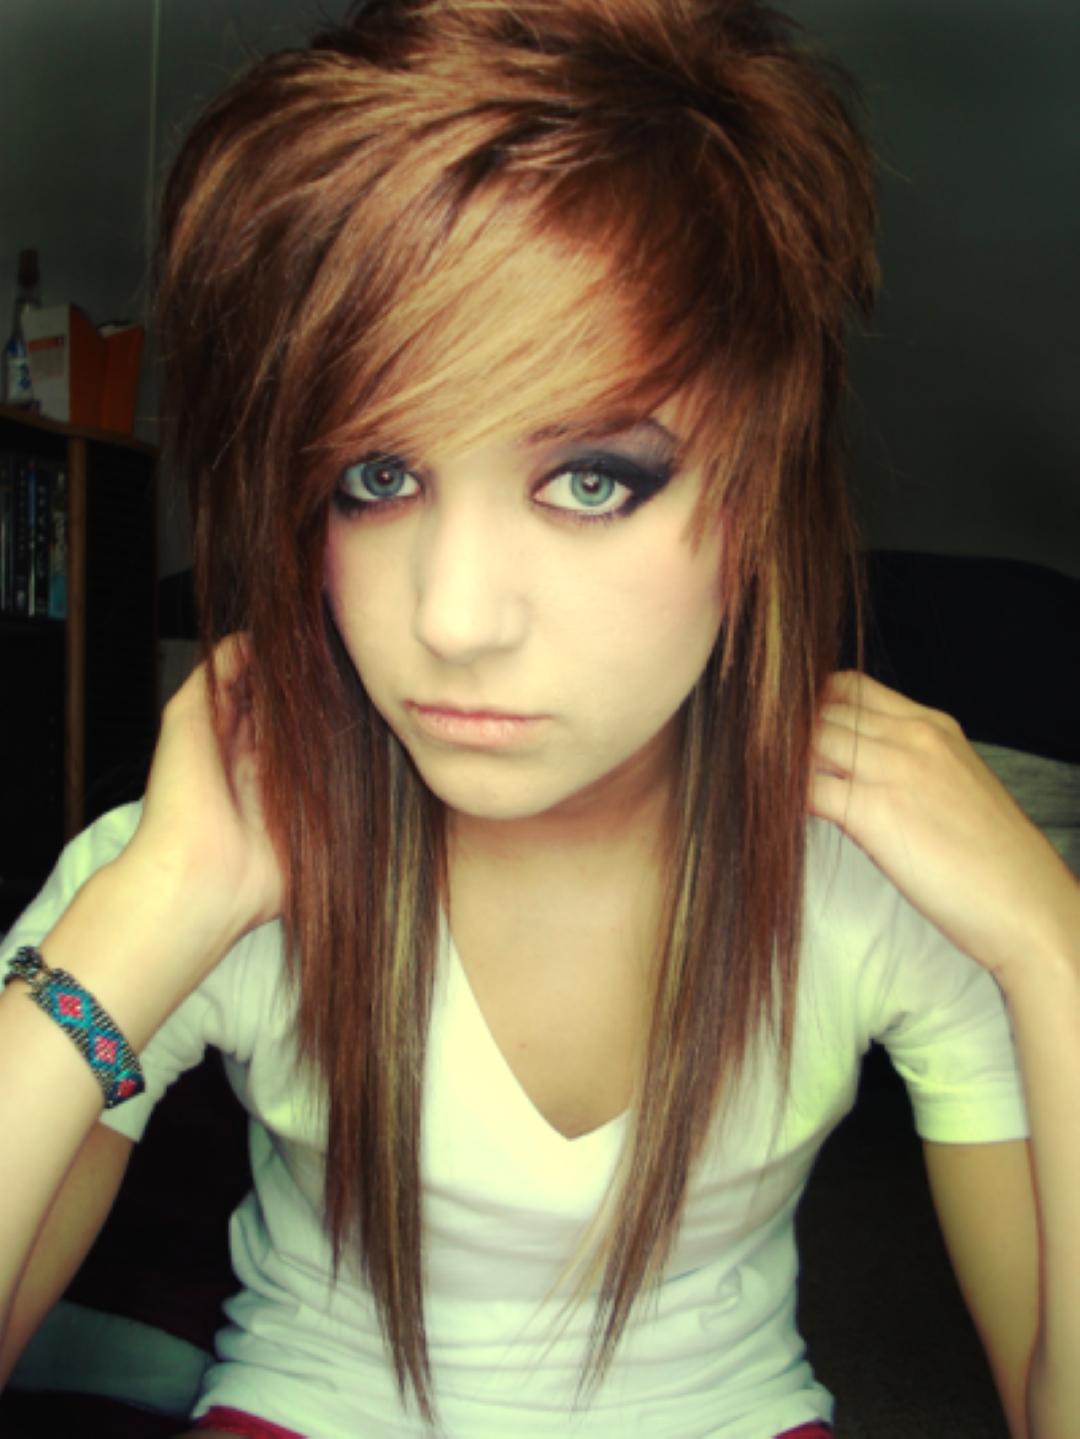 Emo Hairstyles For Girls   Hair Styles   Pinterest   Emo Haircuts intended for Emo Haircuts For Thick Hair Girl